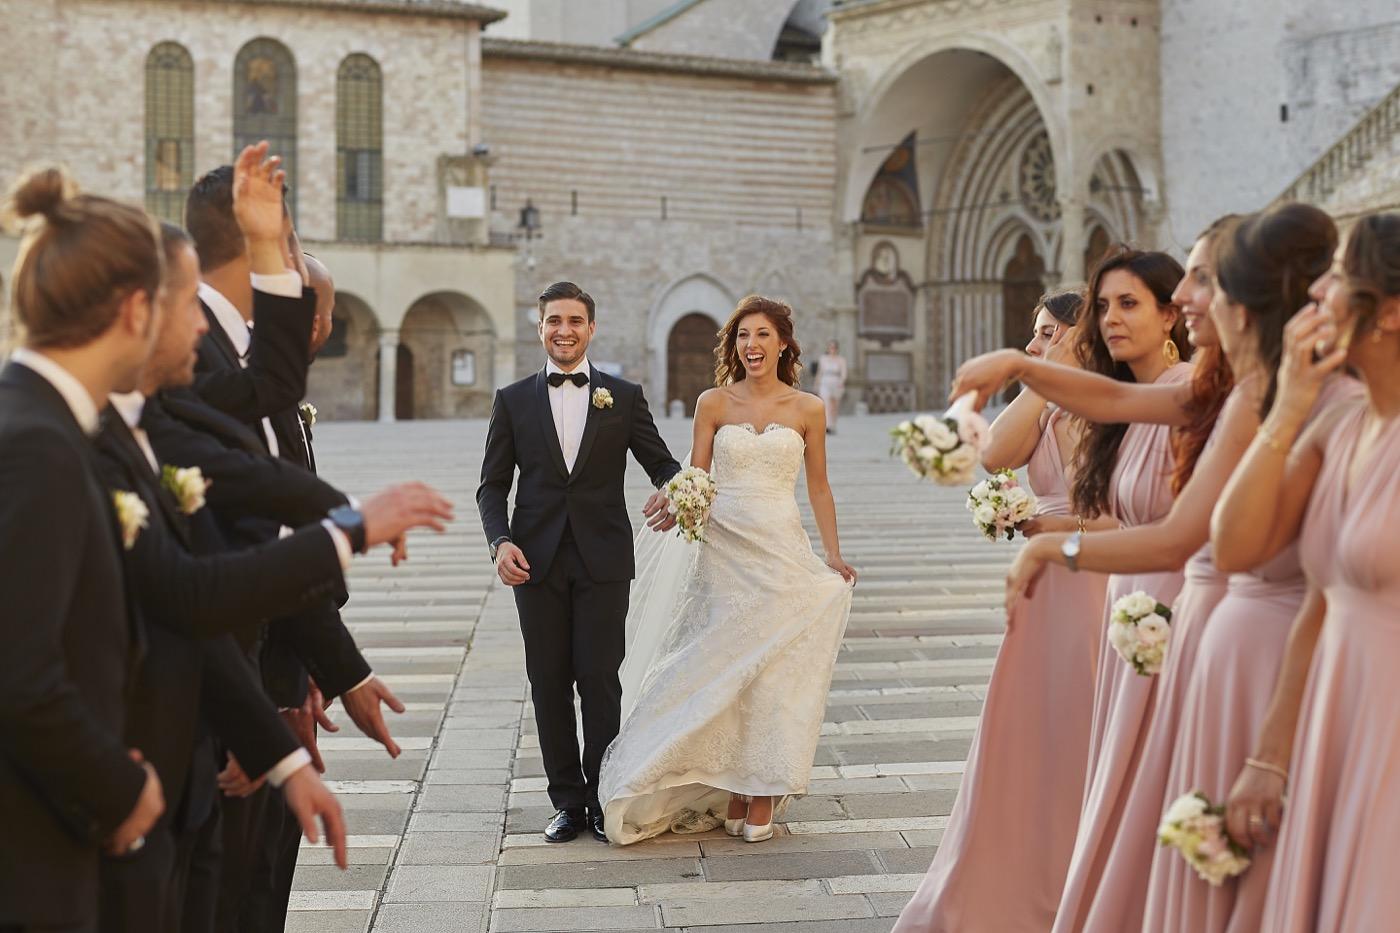 Claudio-Coppola-wedding-photographer-abbazia-7-frati-piegaro-74